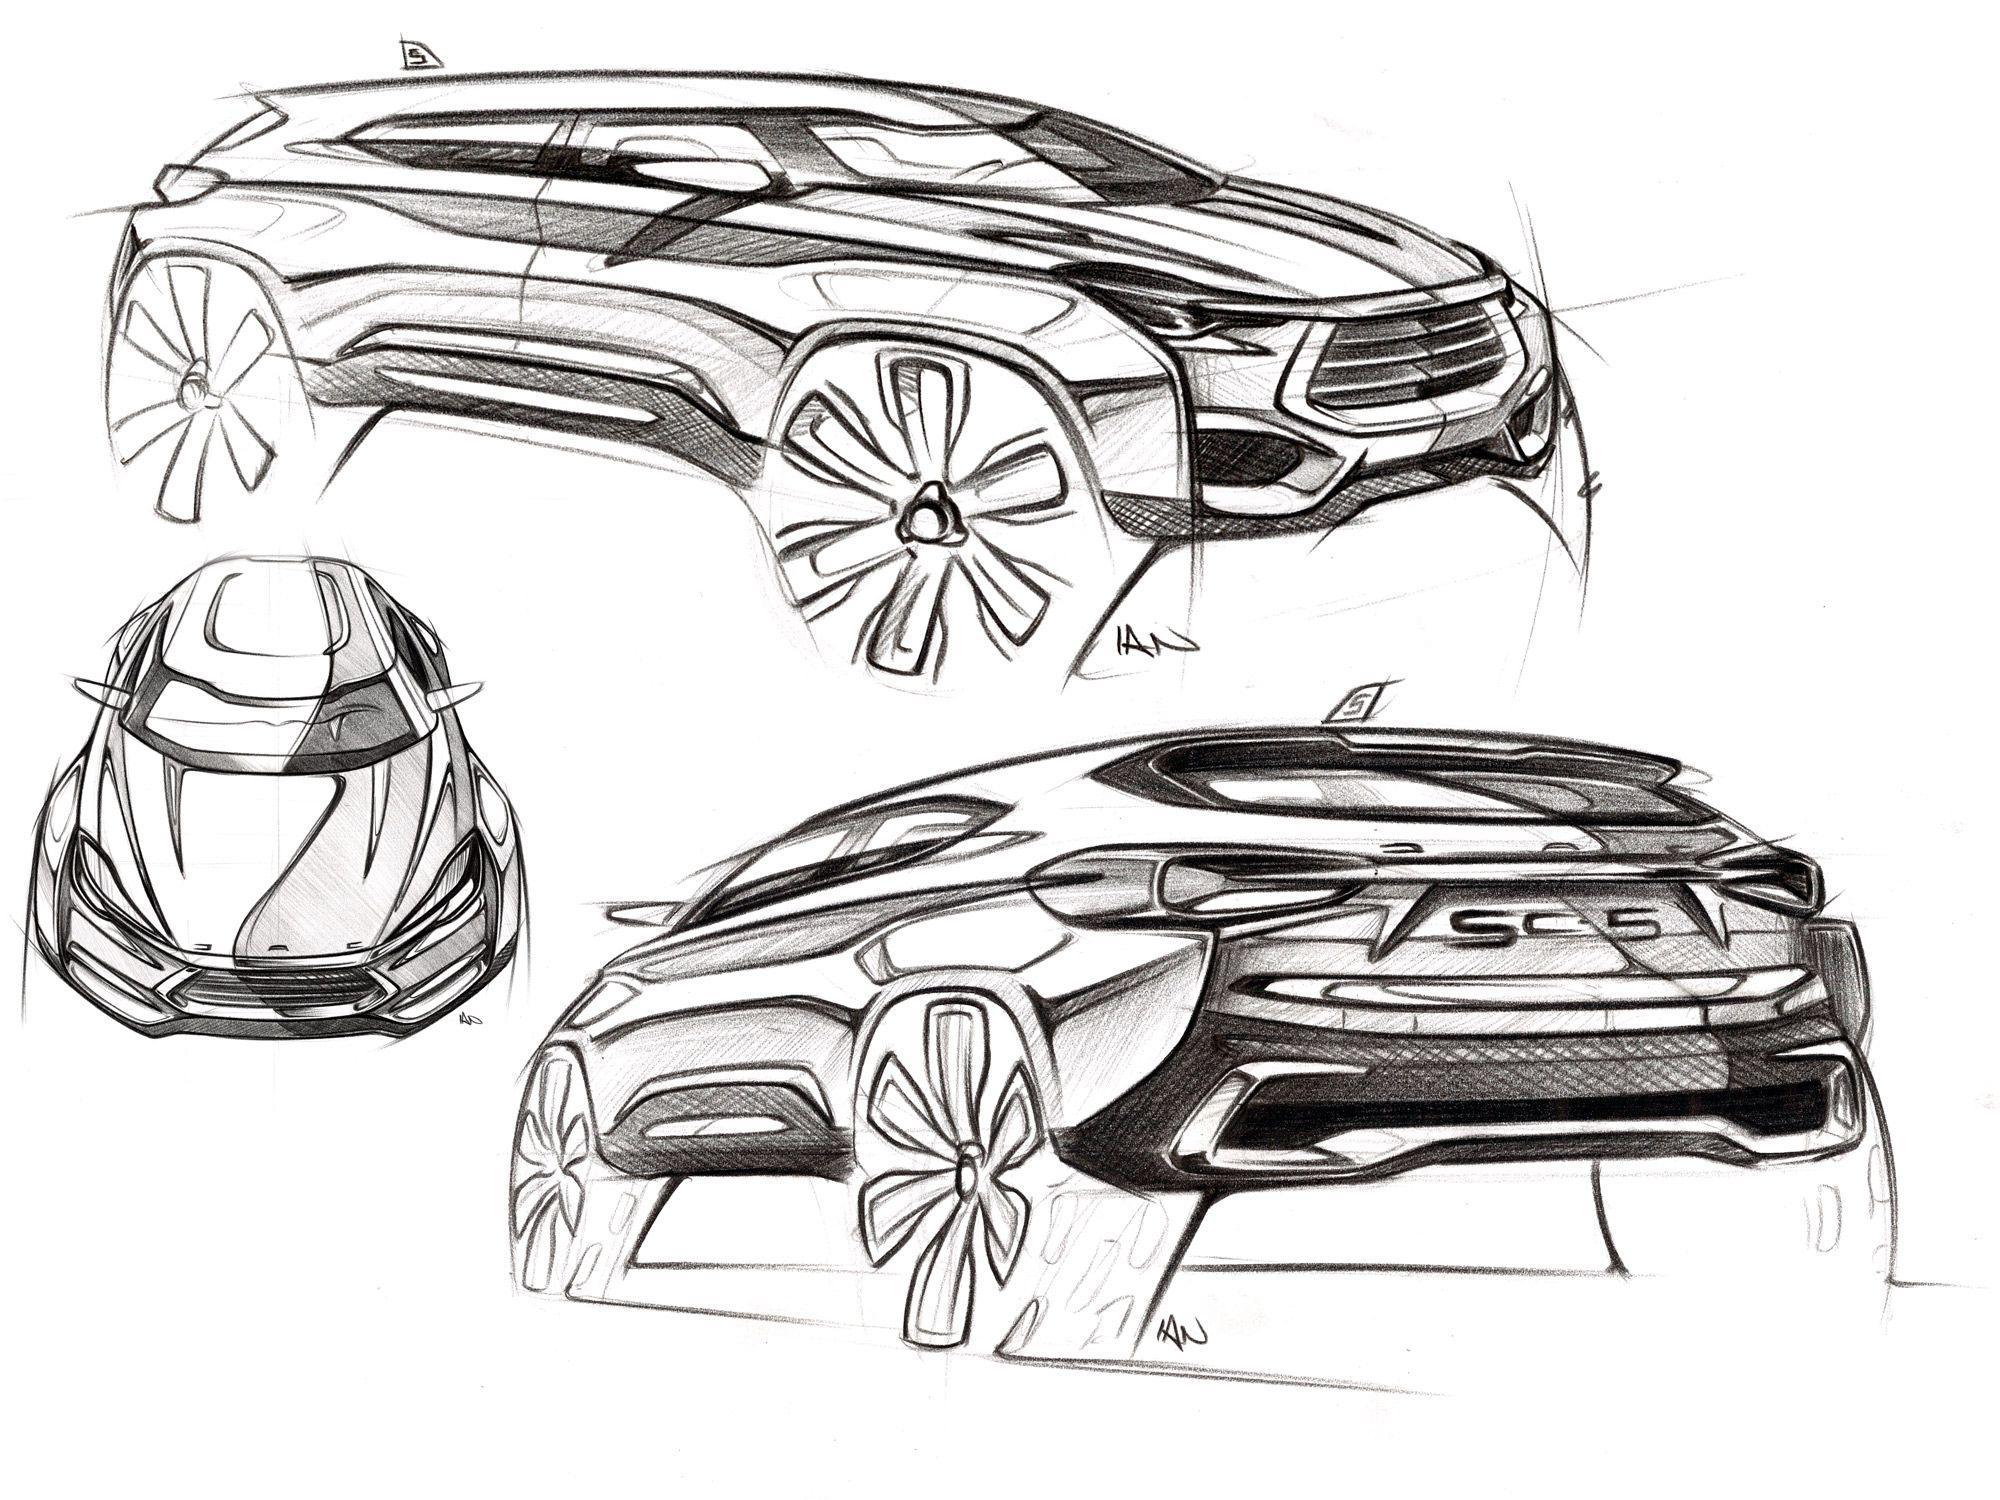 JAC senior designer Ian Gray's exterior sketches of the SC